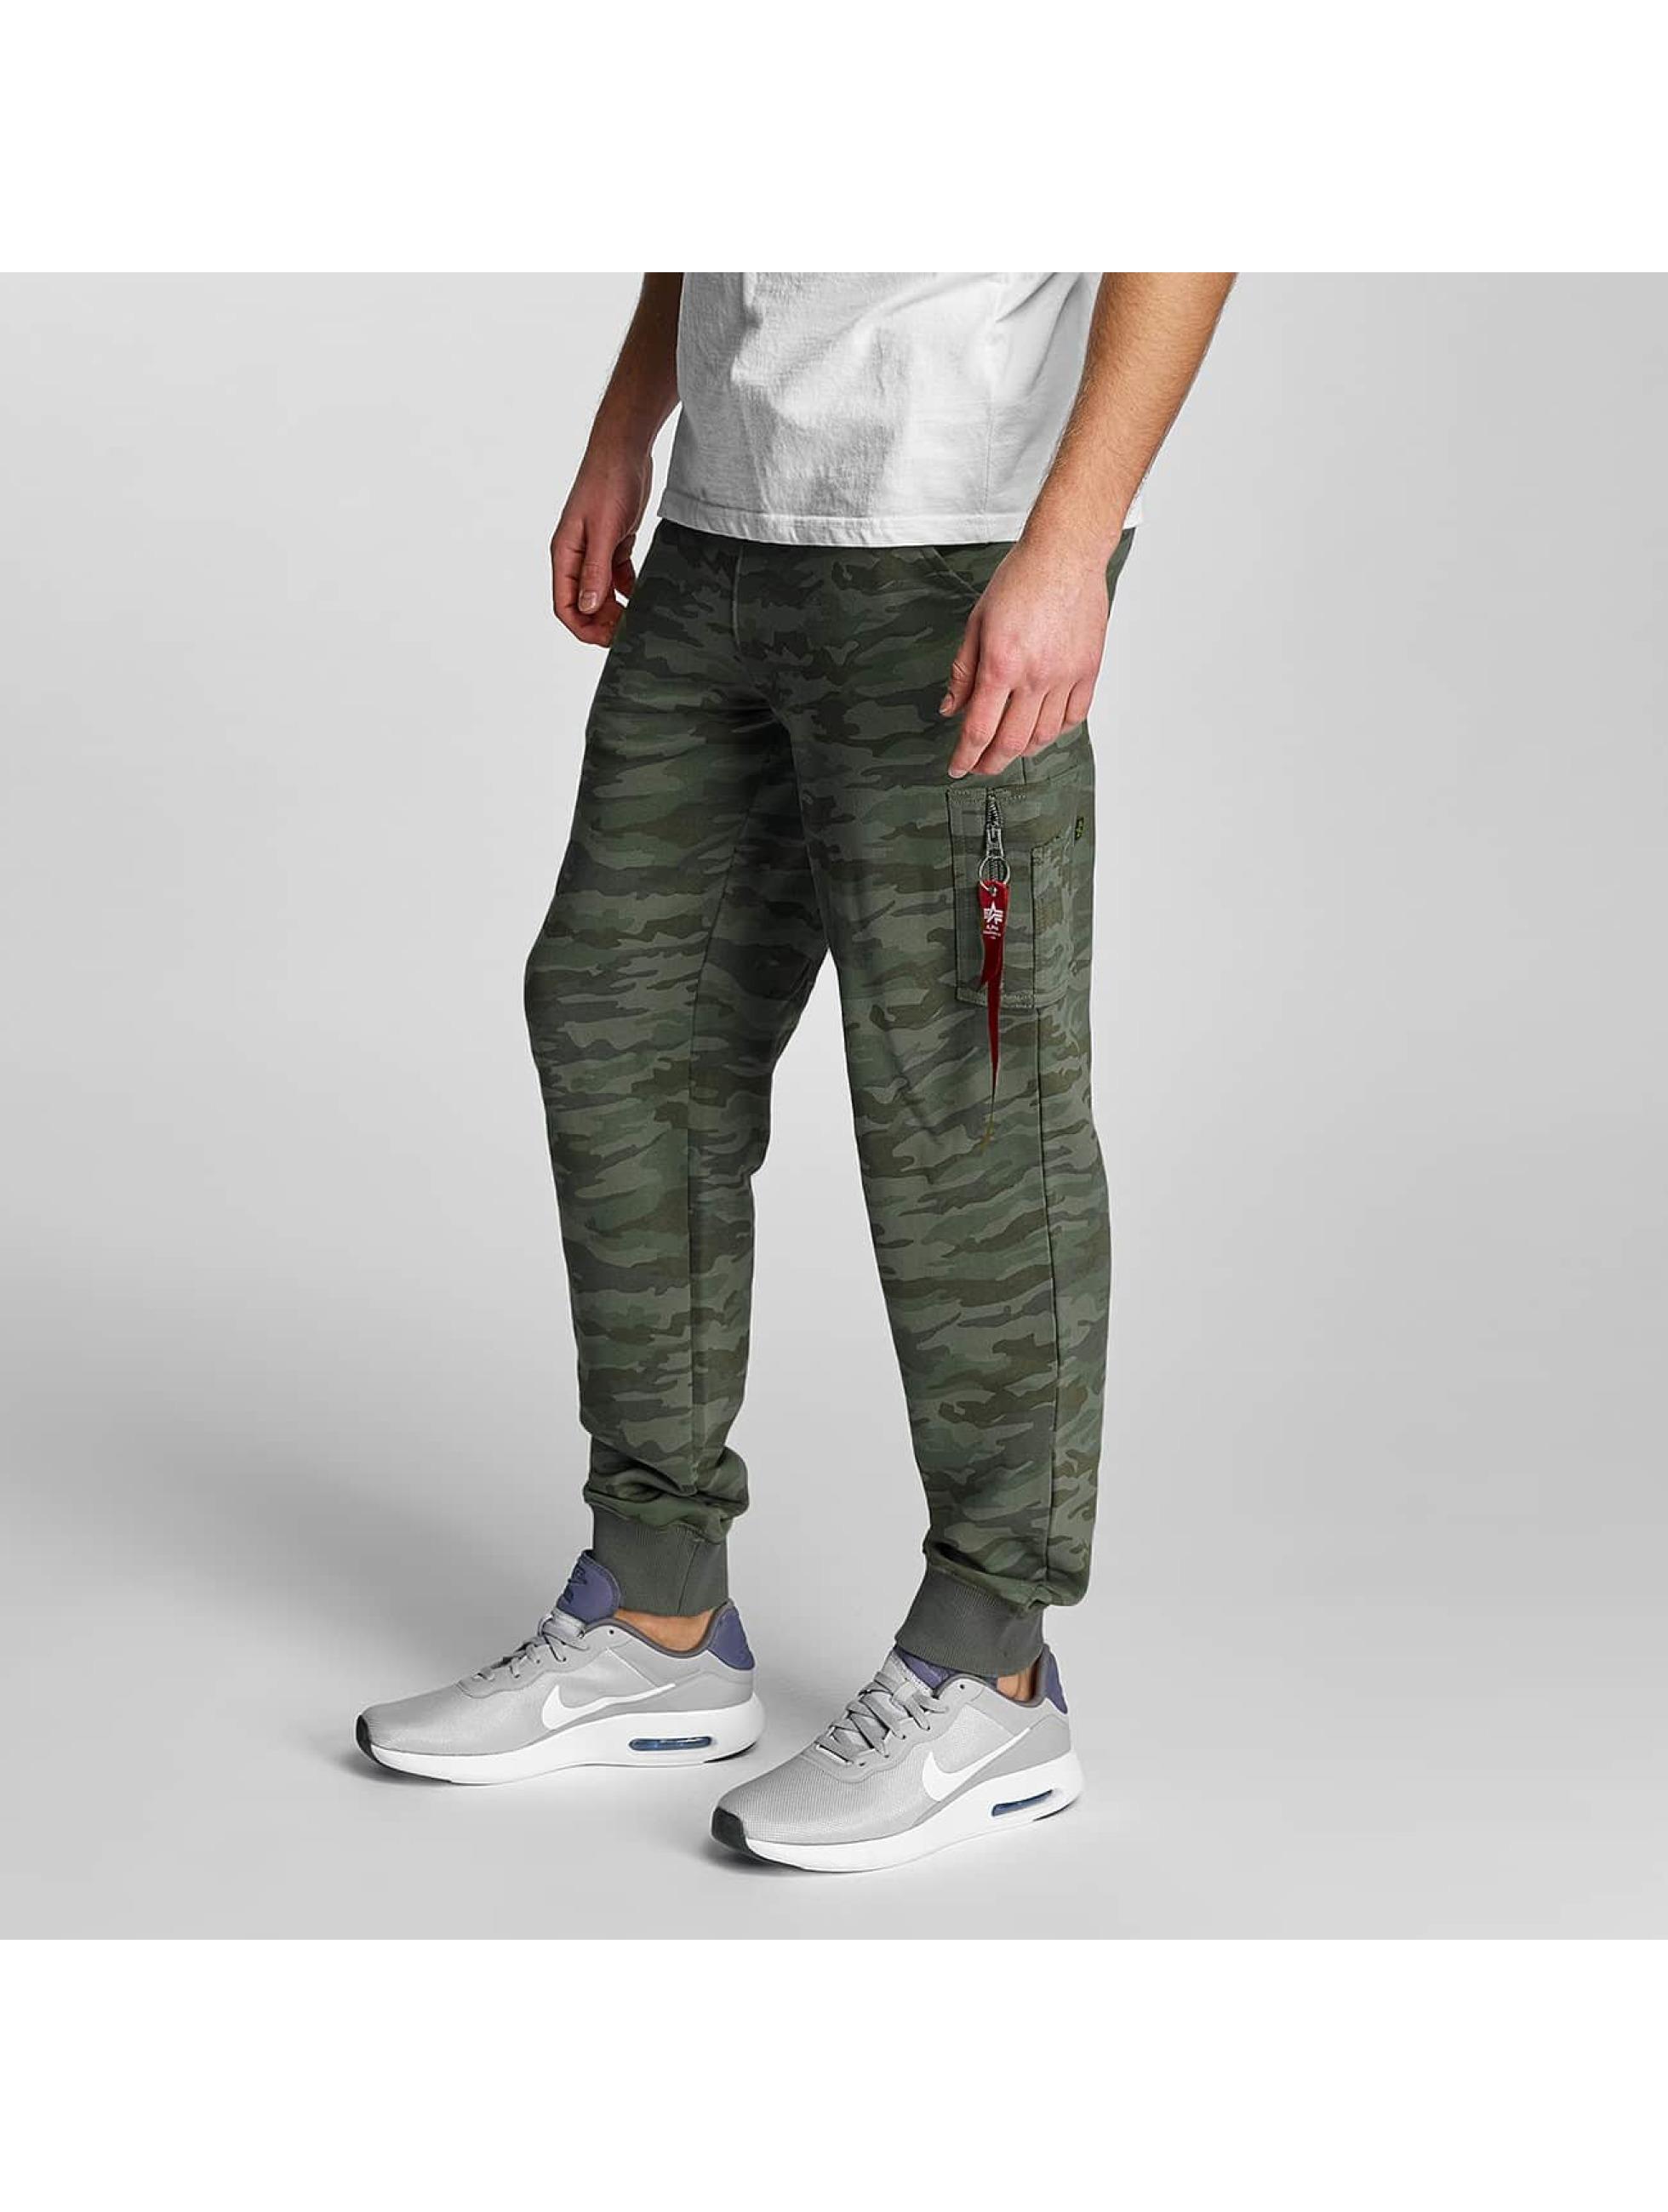 alpha industries herren hosen jogginghose x fit cargo ebay